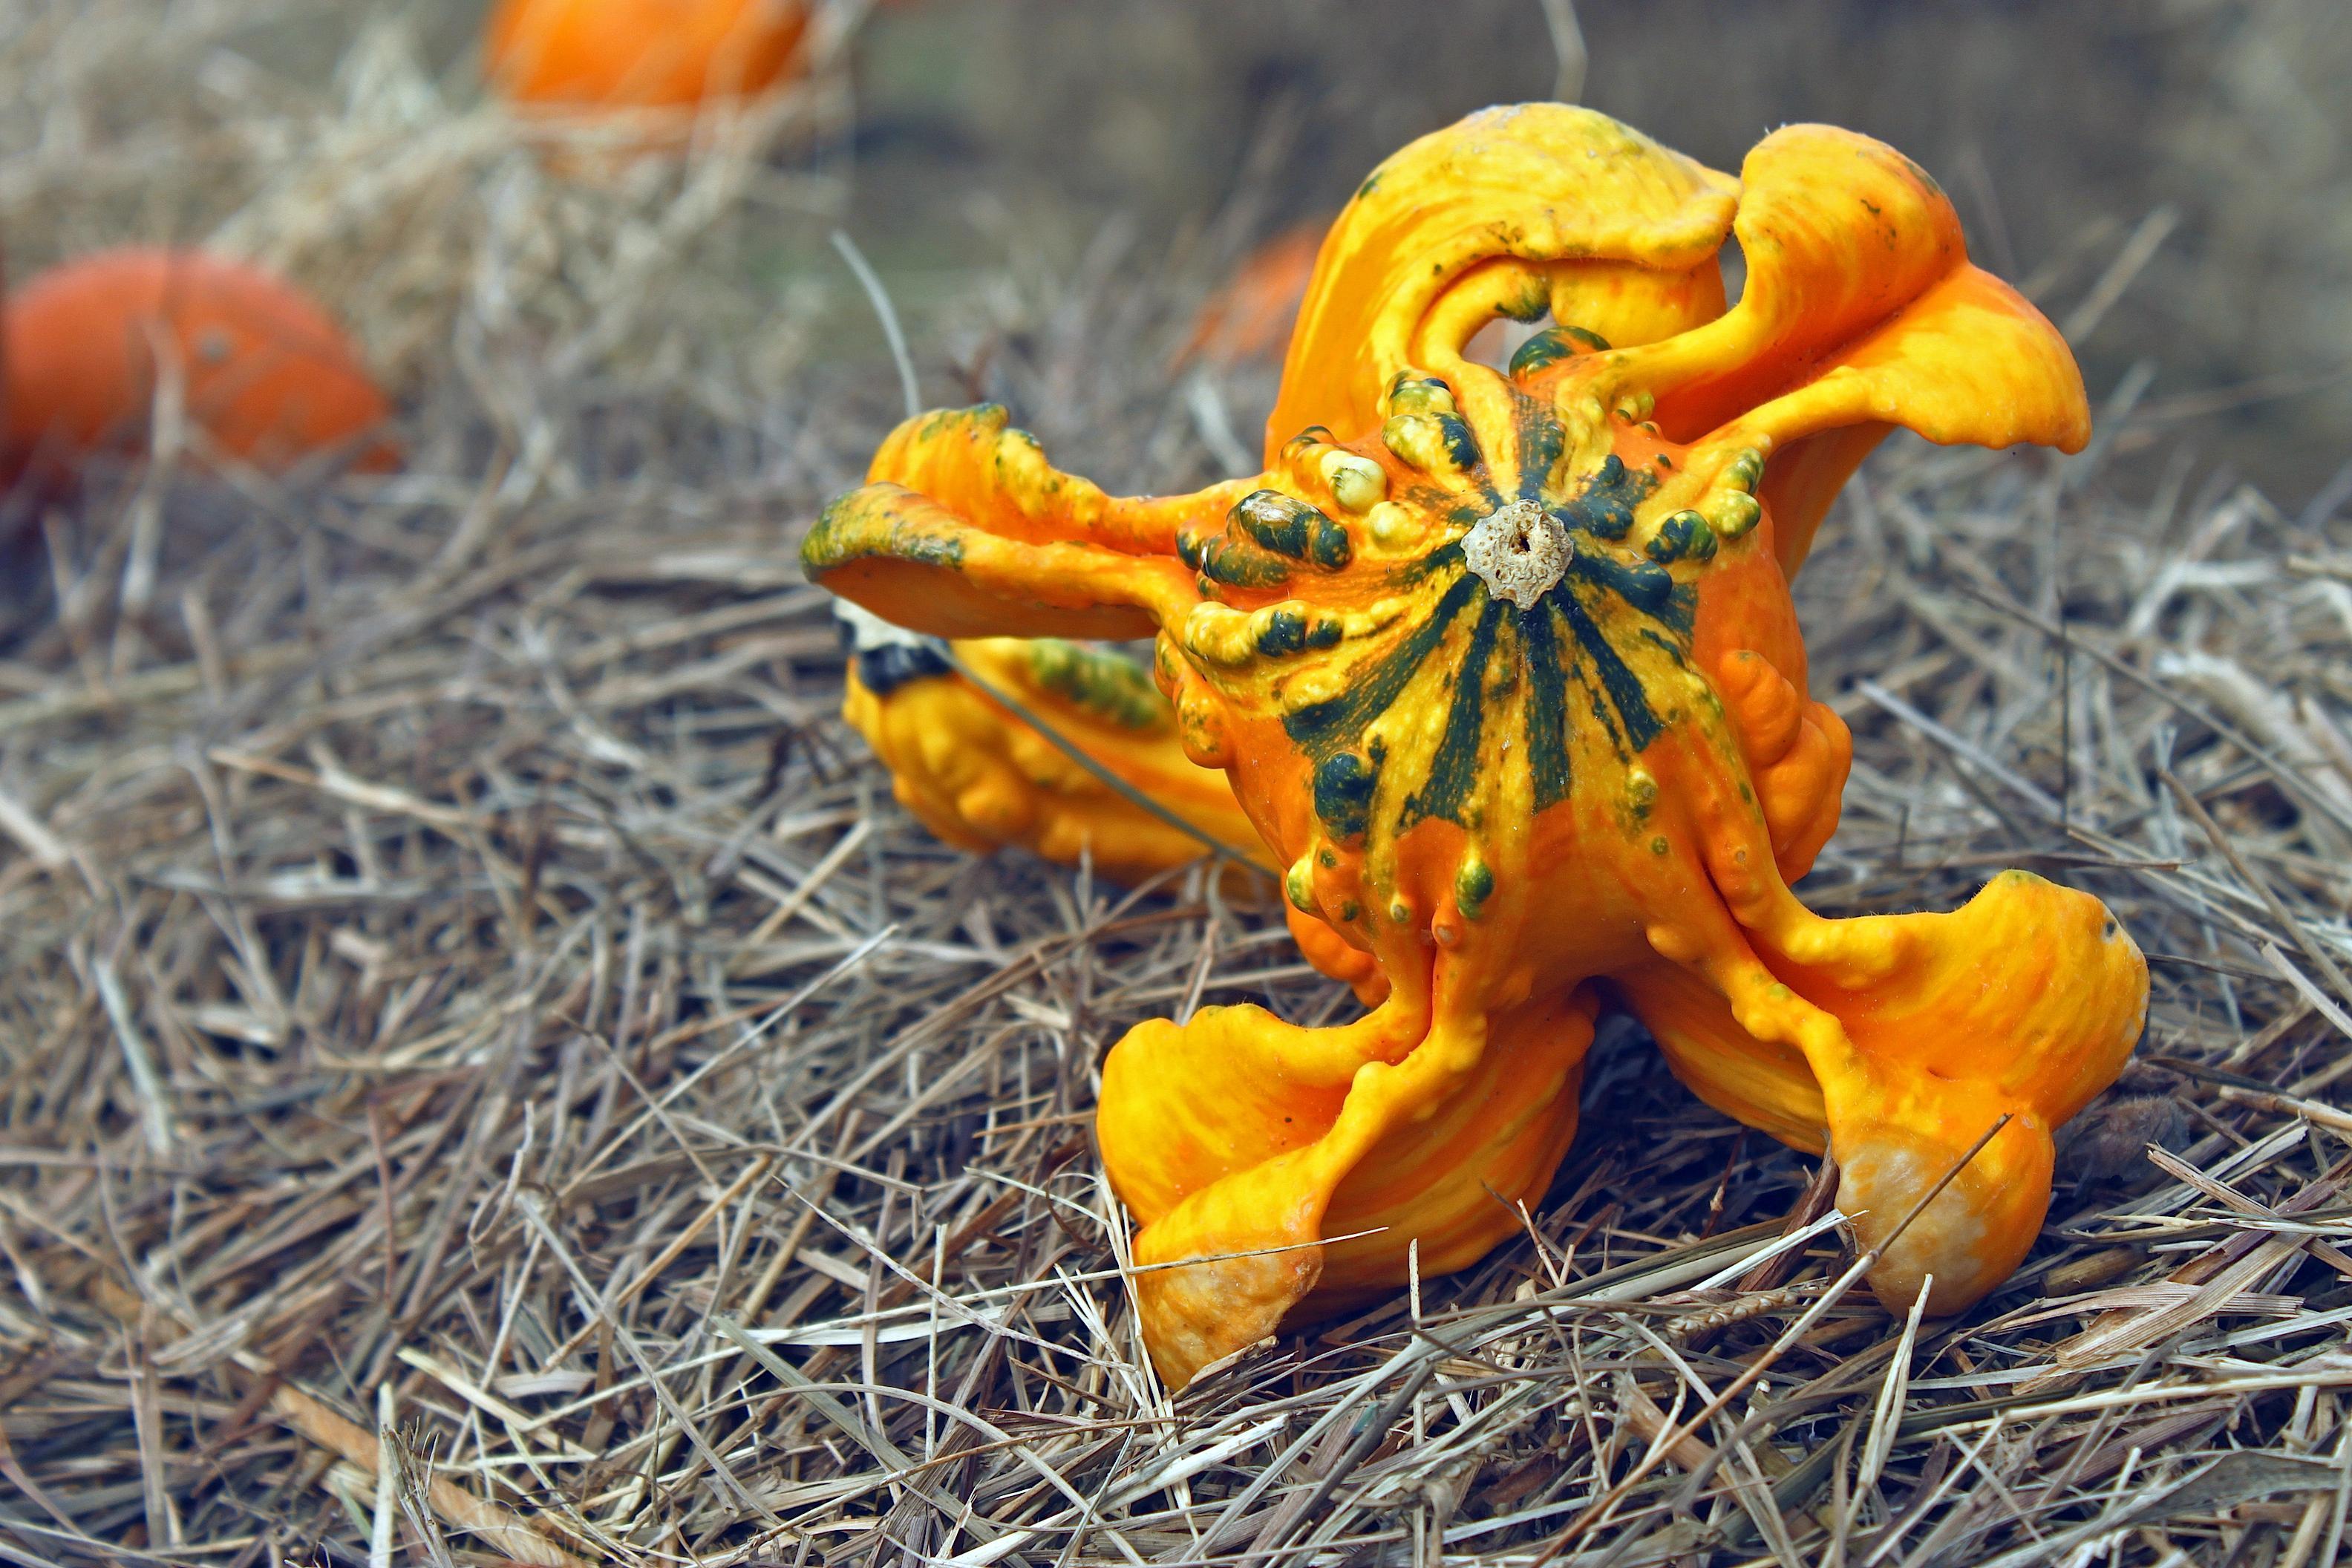 Lumpy Gourd